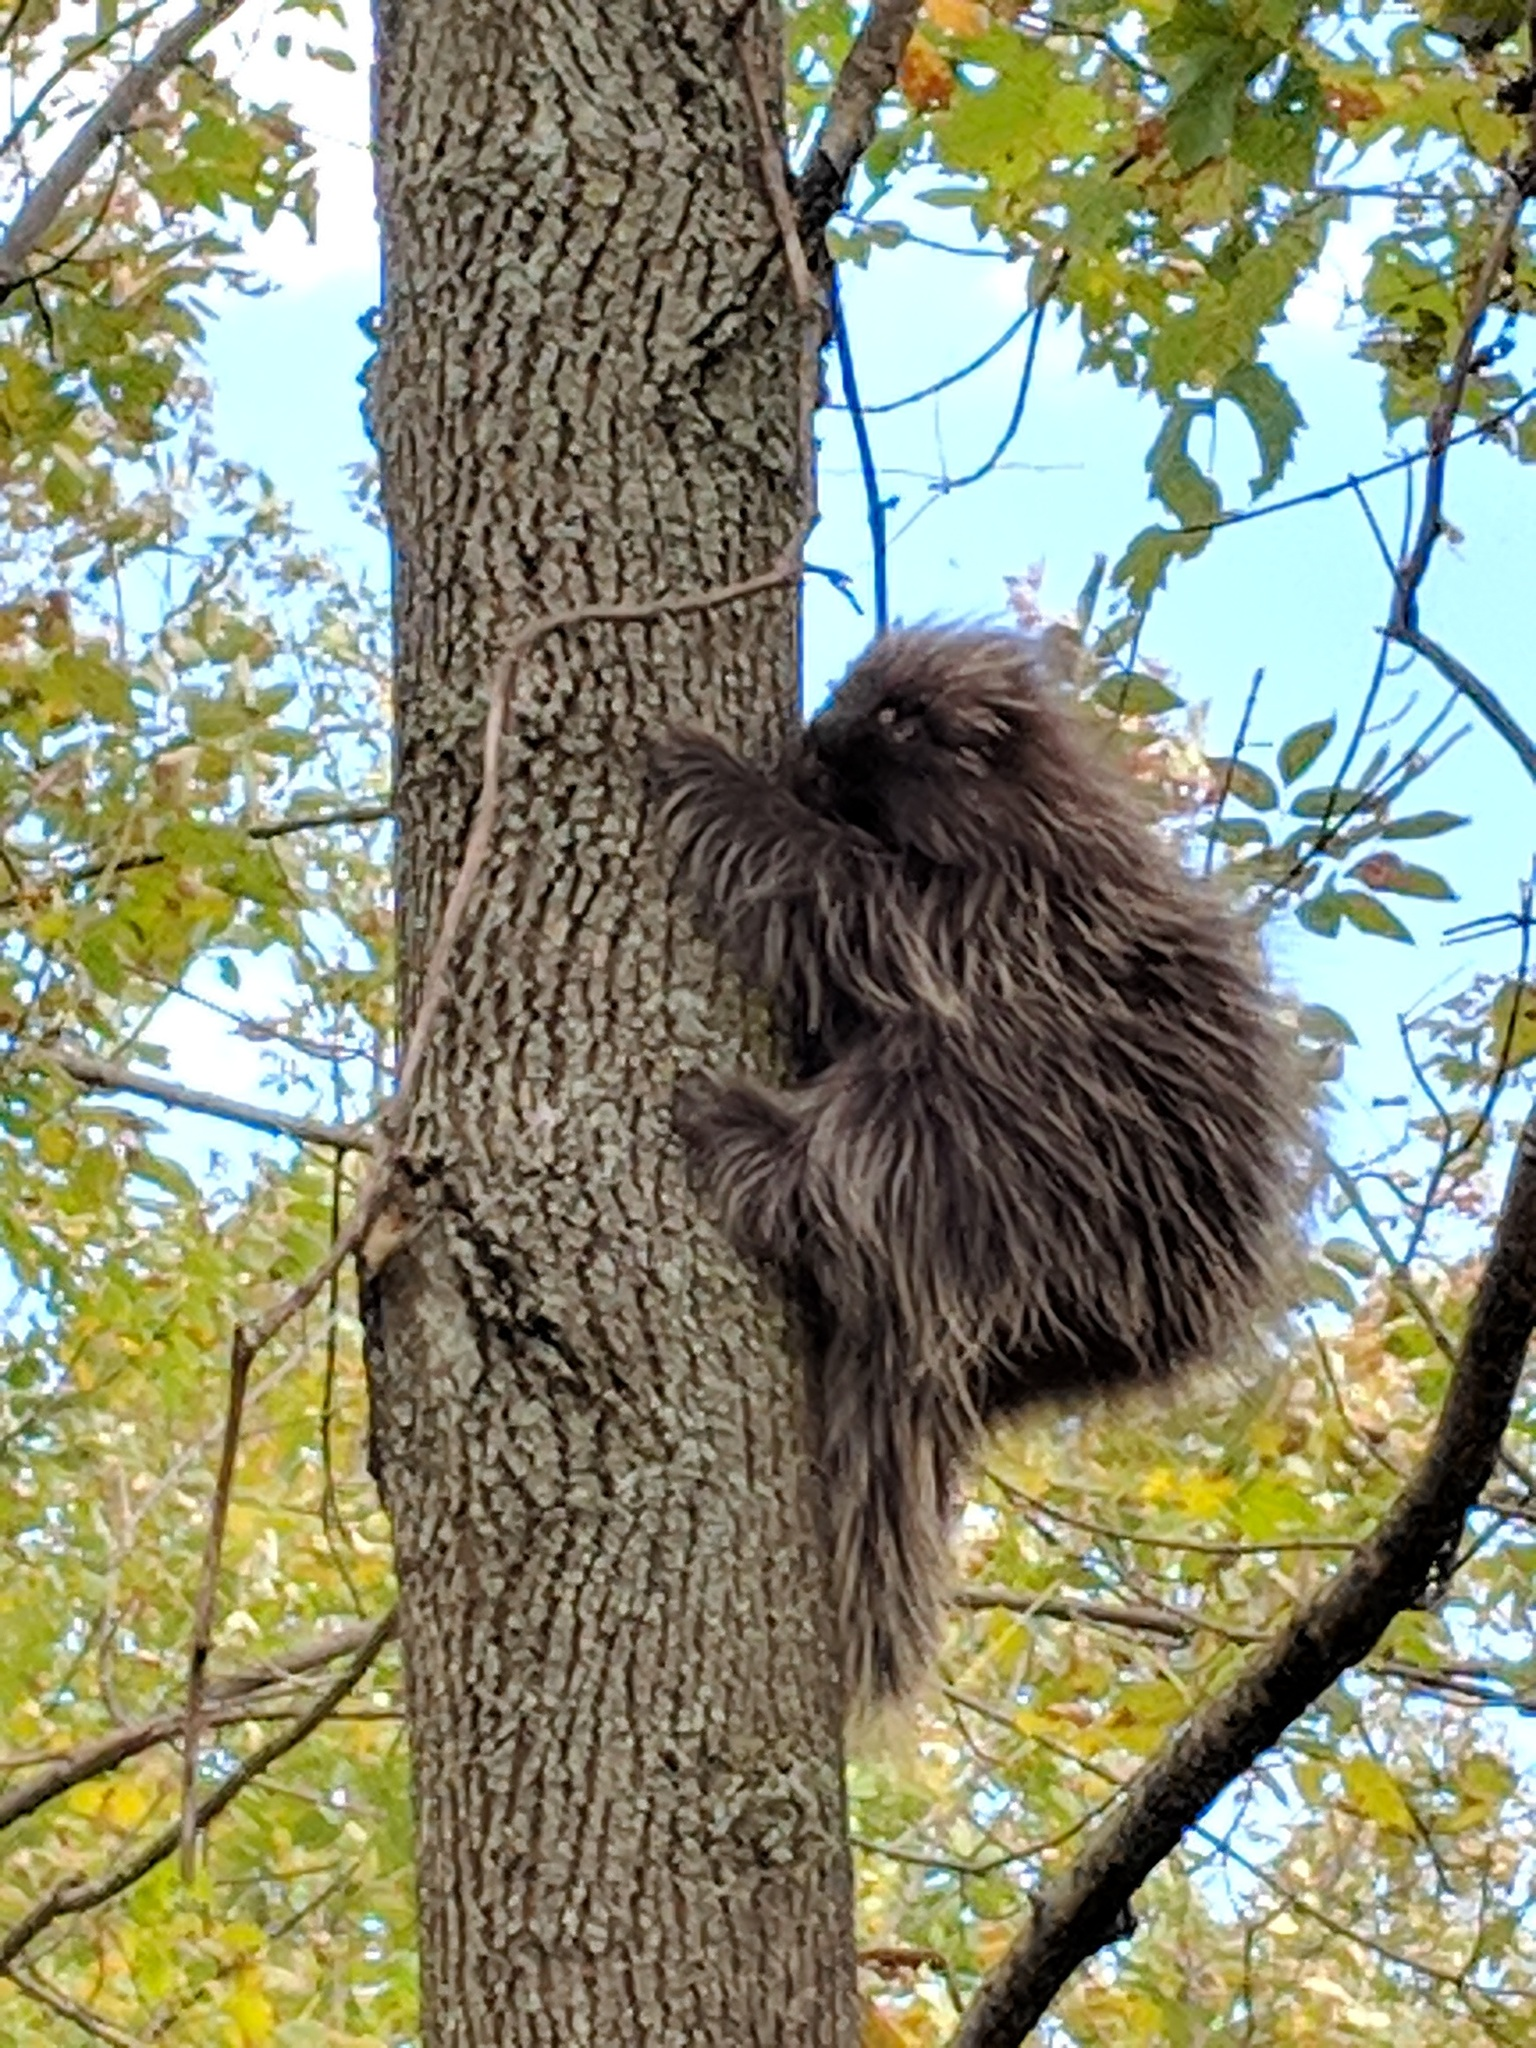 North American Porcupine (Erethizon dorsatum) observed by Jessica Consiglio